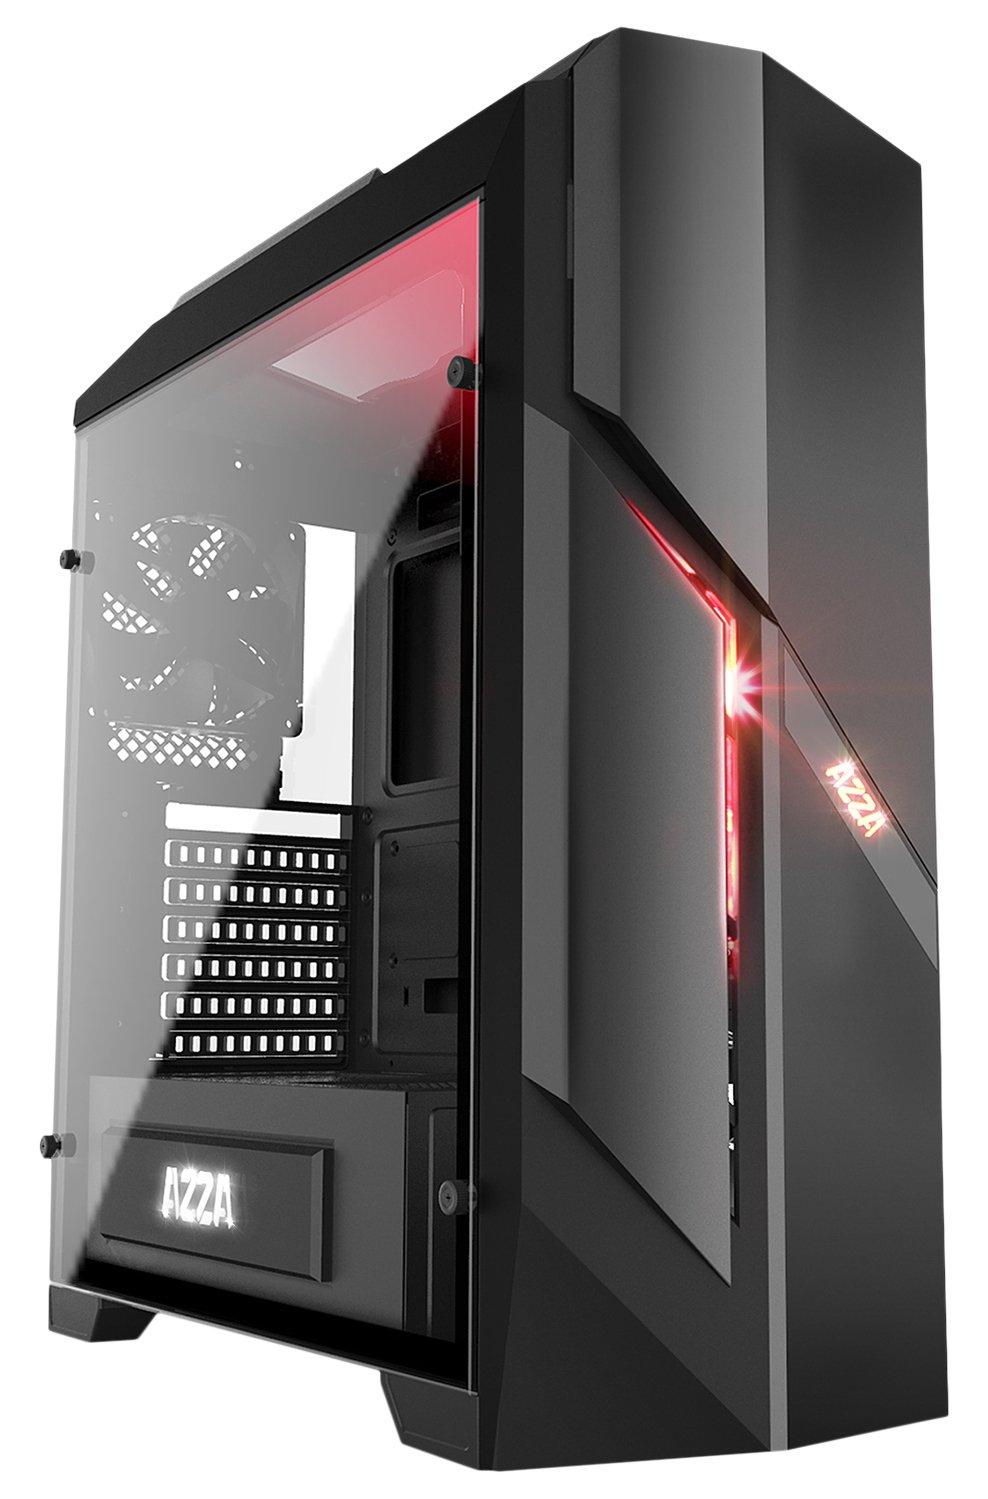 Azza Photios250X Midi-Tower Negro Carcasa de Ordenador - Caja de Ordenador (Midi-Tower, PC, EVA (Etileno Acetato de Vinilo), Vidrio Templado, ATX,Micro-ATX, ...